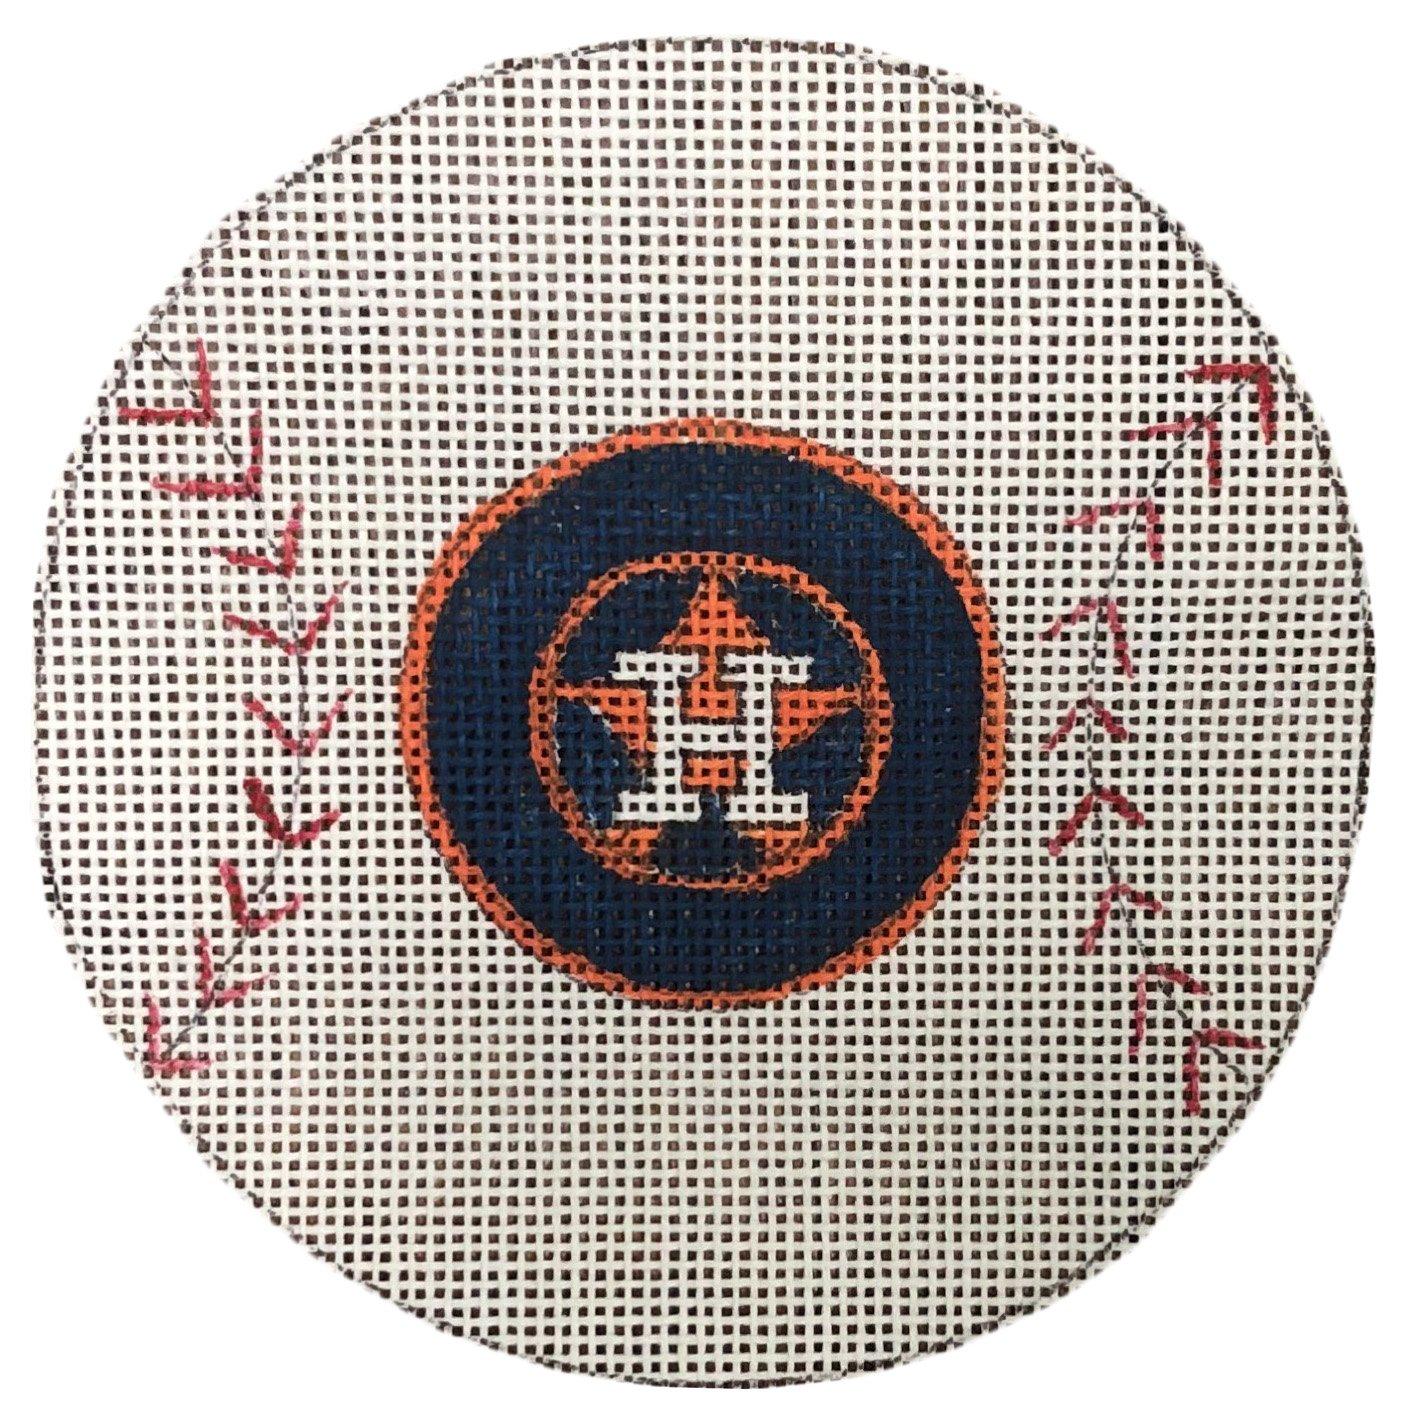 PC-Houston Astros Baseball Ornament  4 Round  18M